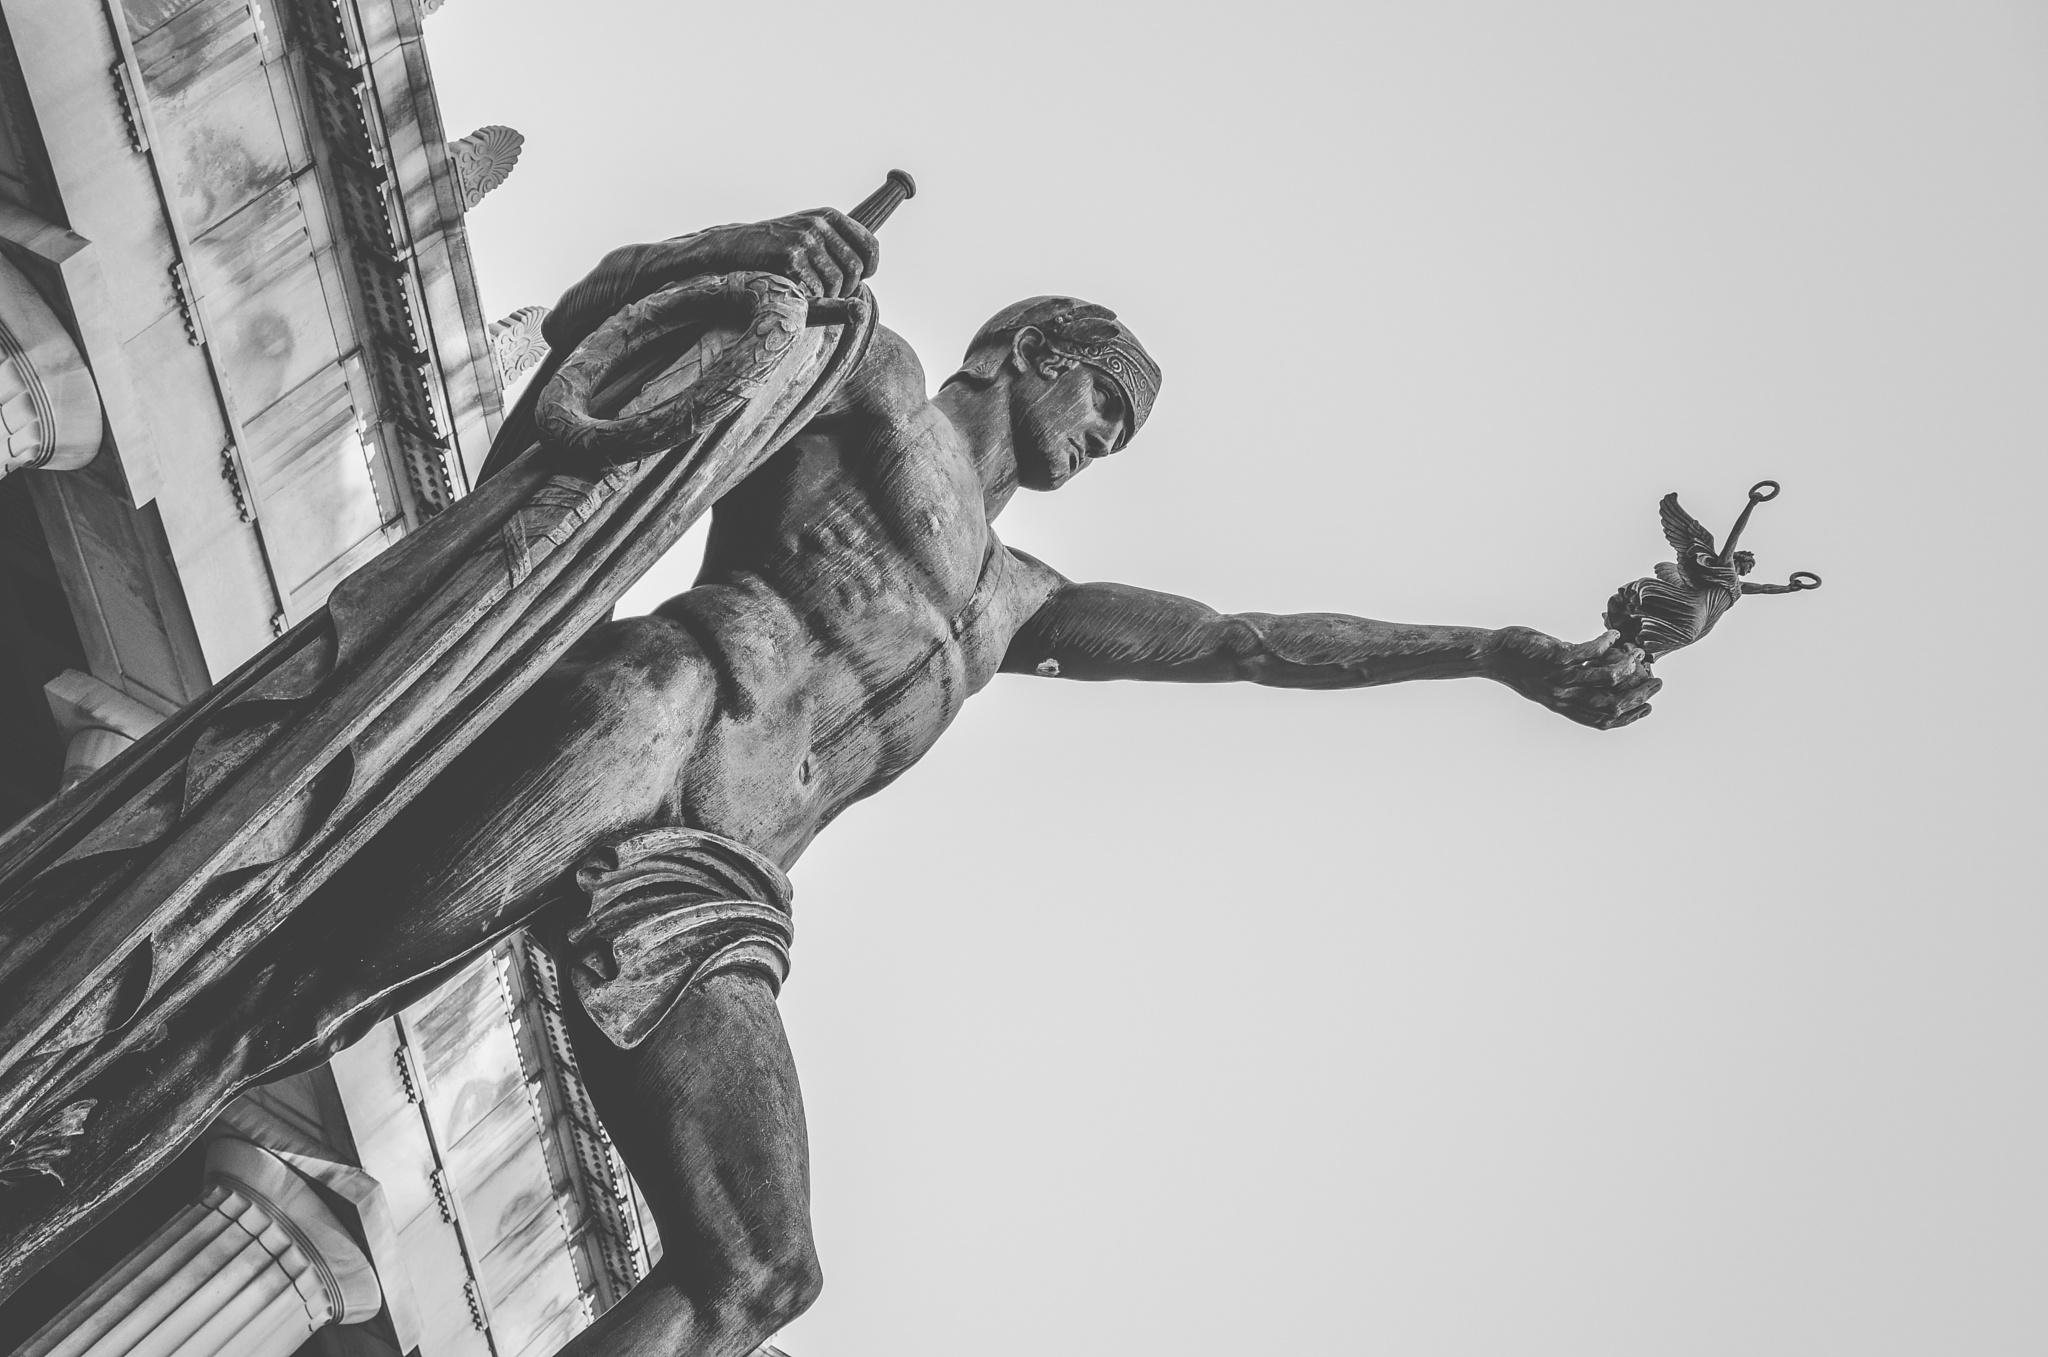 War Memorial Statue 3 by Carlene Hall